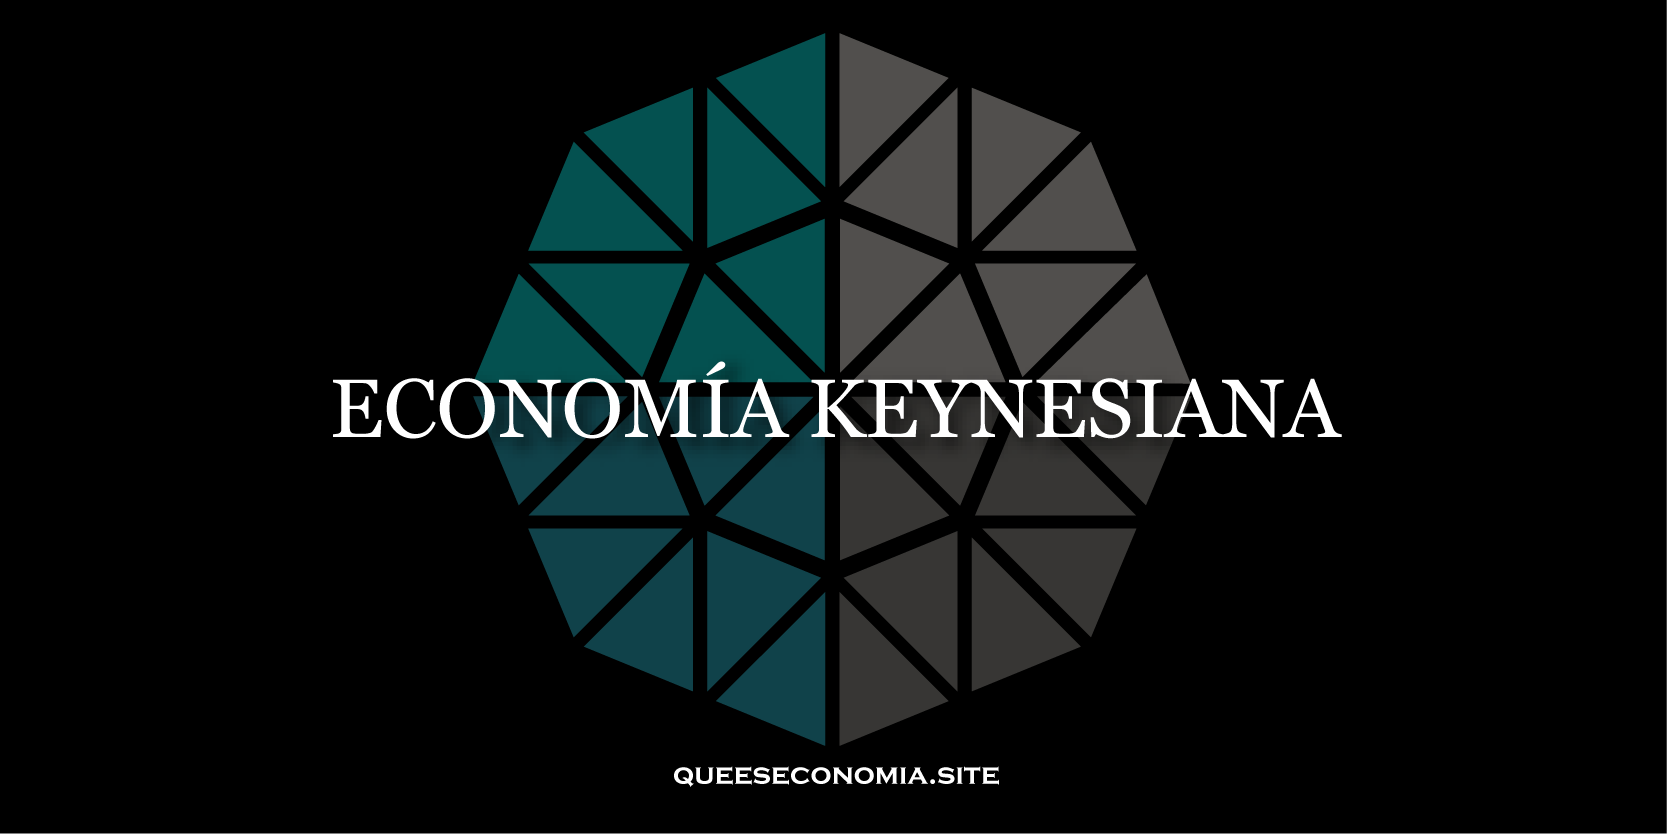 economía keynesiana